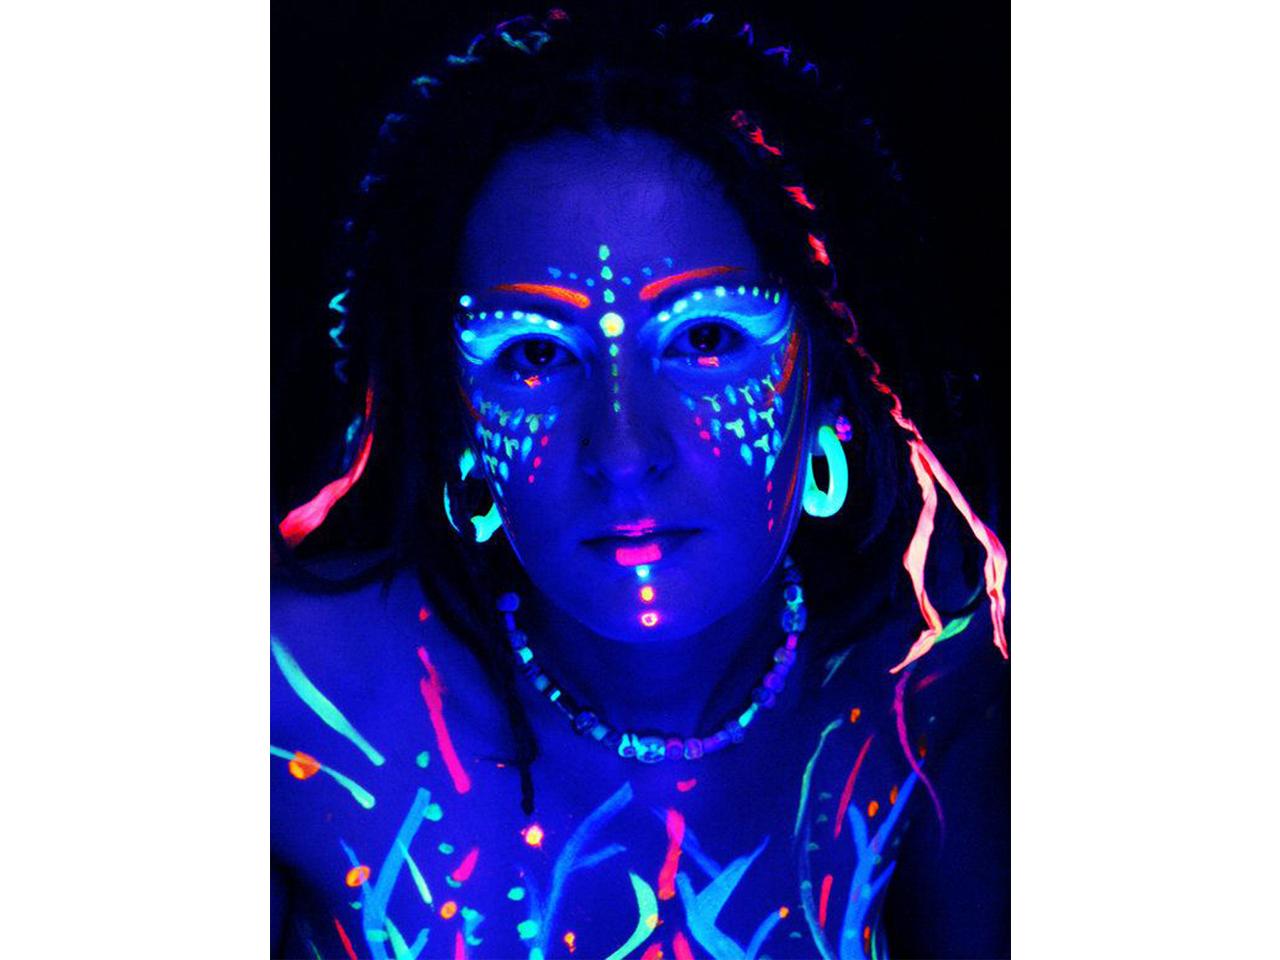 Stargazer Mini Neon UV Face and Body Paint